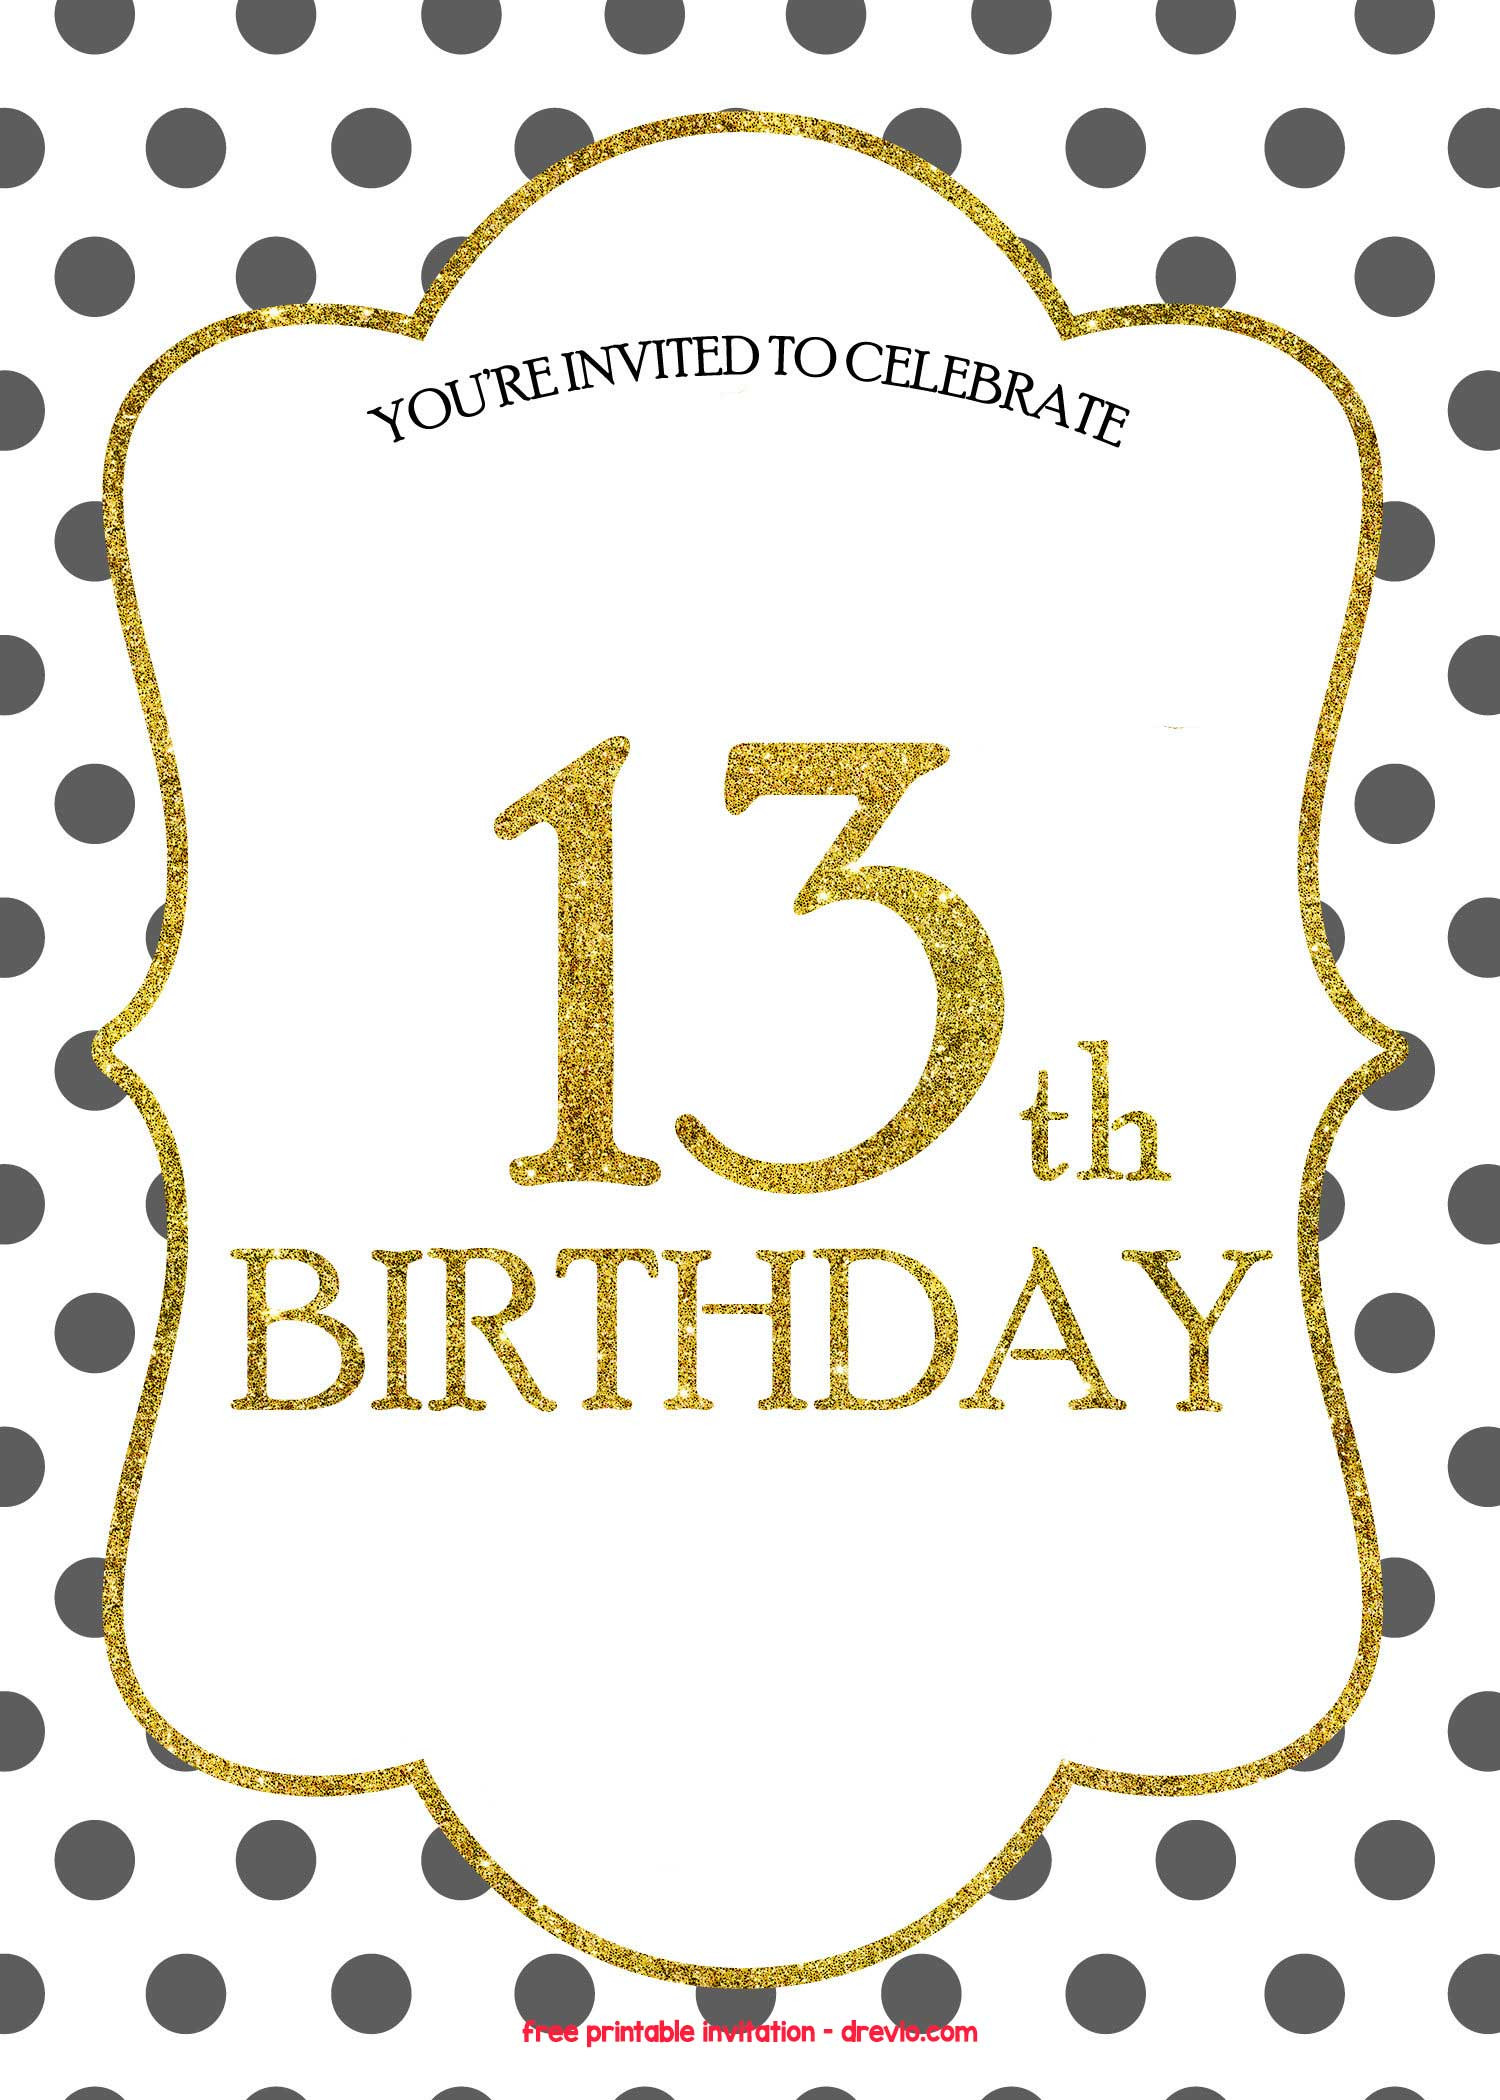 Free Templates For Birthday Invitations  FREE 13th Birthday Invitations Templates